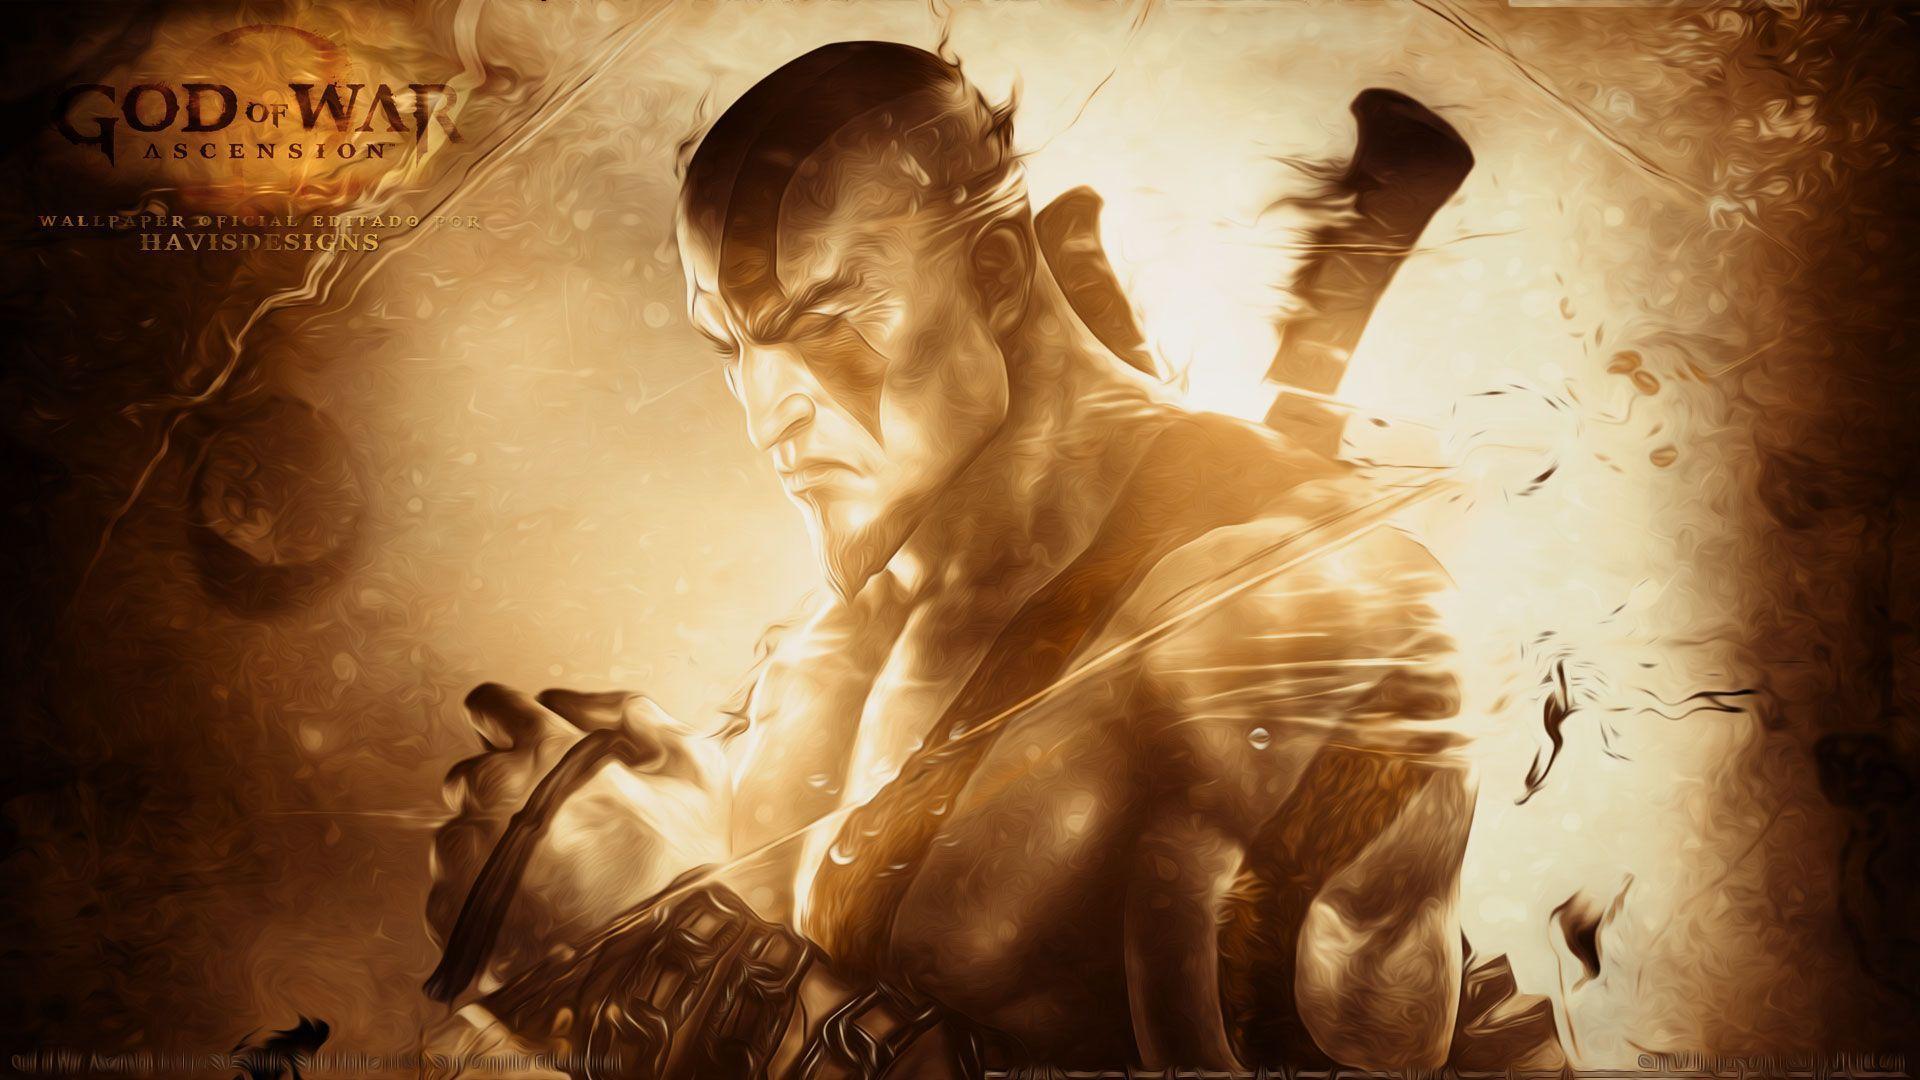 Games Wallpapers - God of War: Ascension 1920x1080 wallpaper